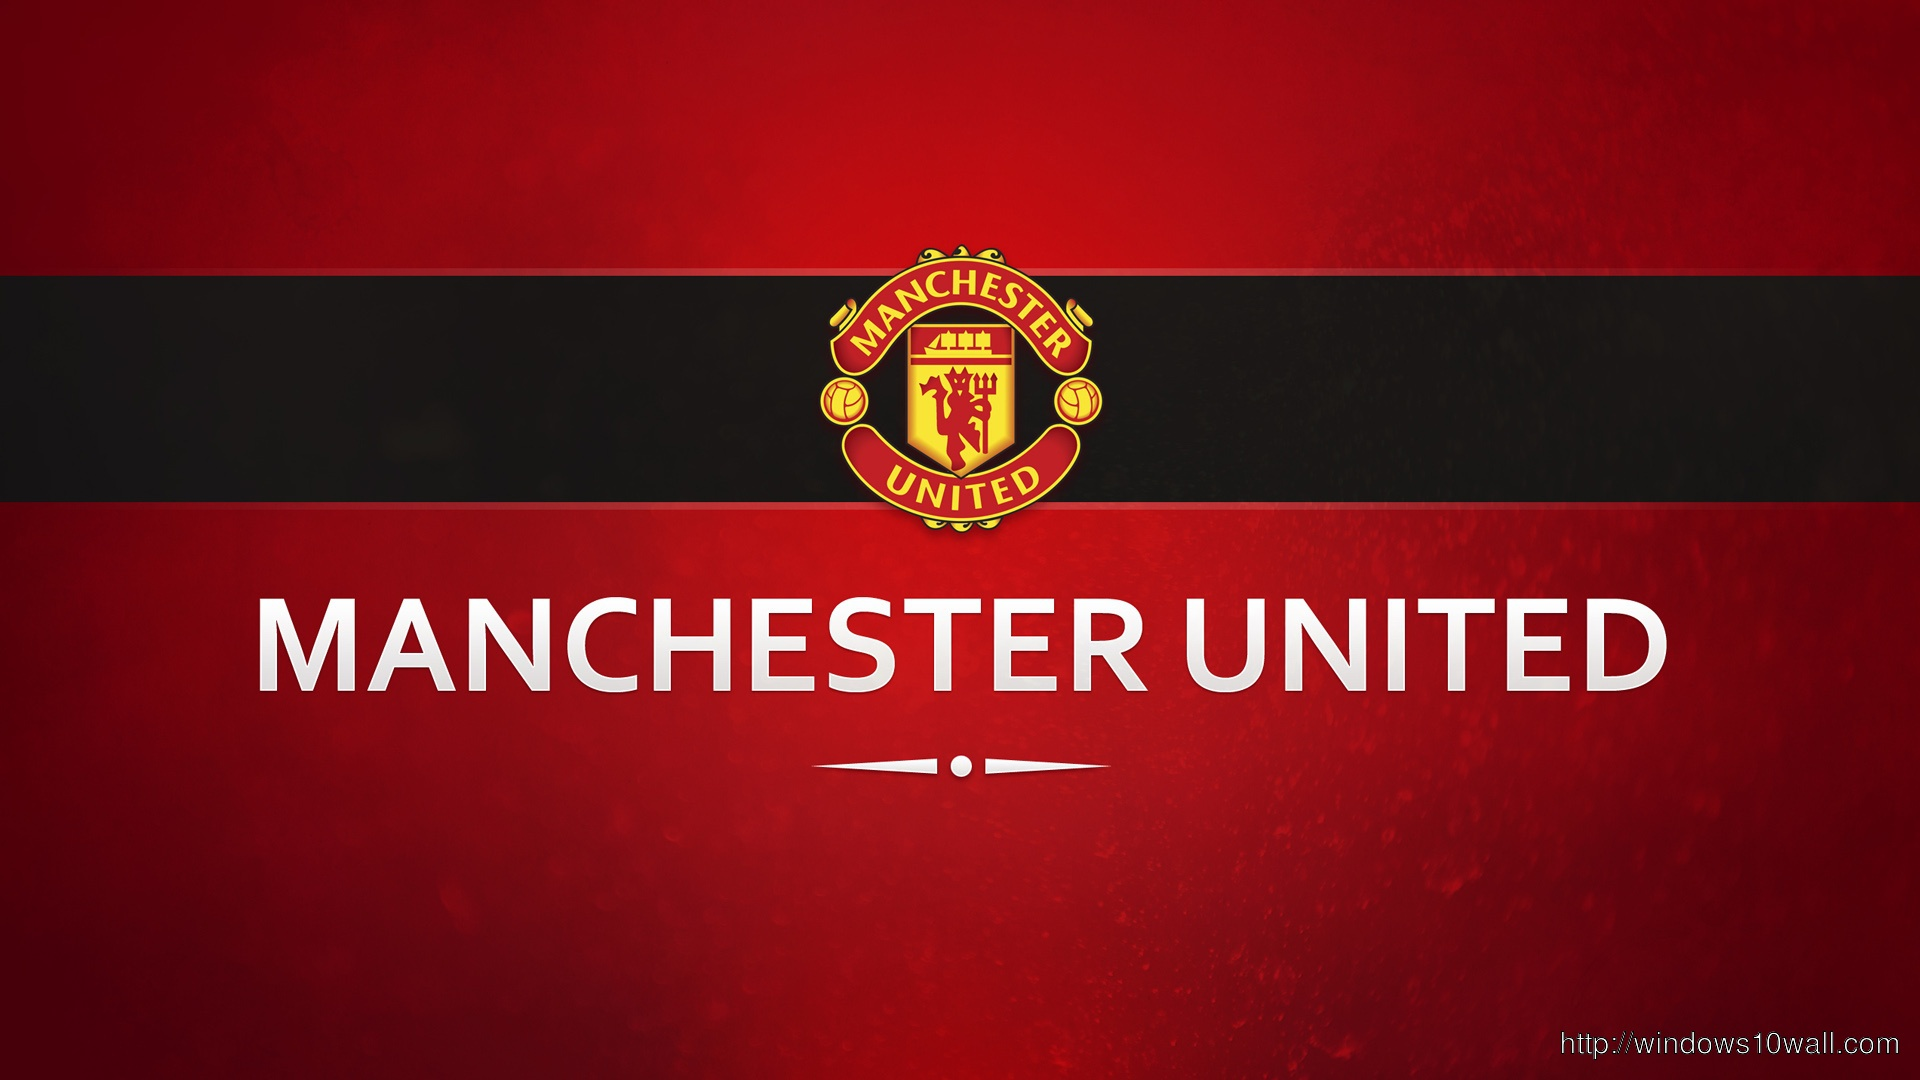 Man United 2013 Desktop Background Wallpaper